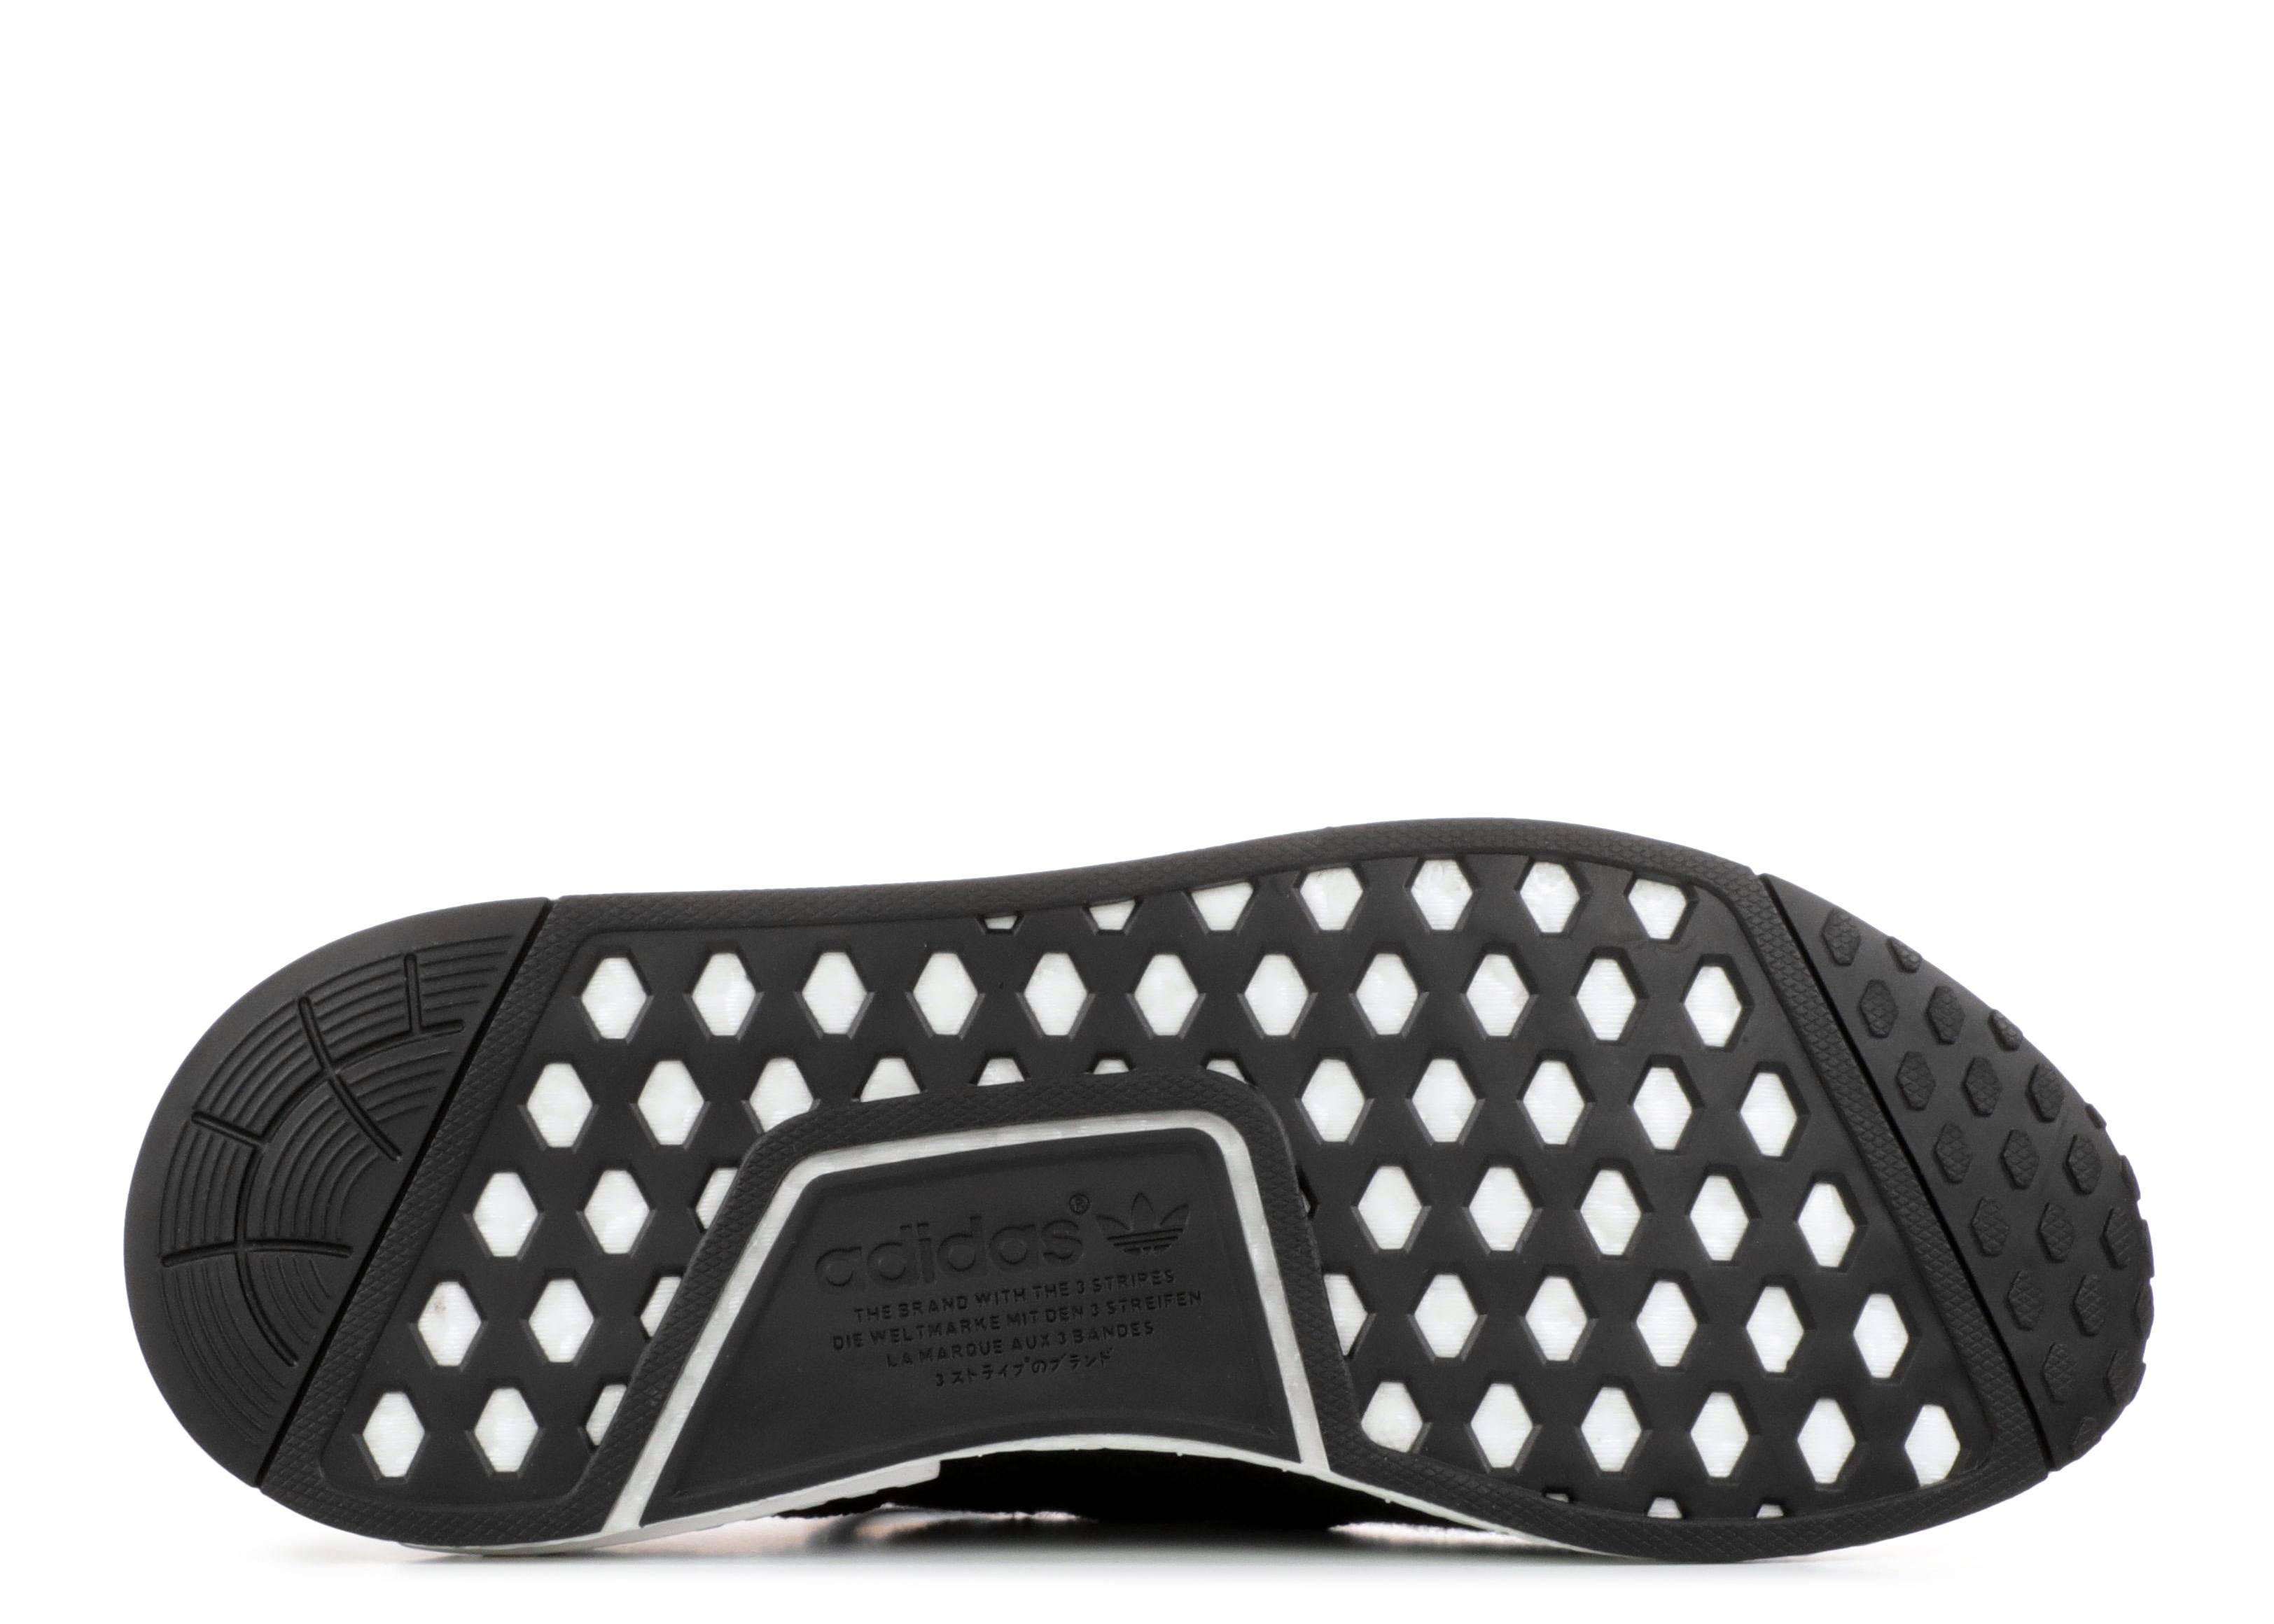 0121bc424f119 Adidas Nmd R1 A Ma Maniere X Invincible Cashmere Wool - 4